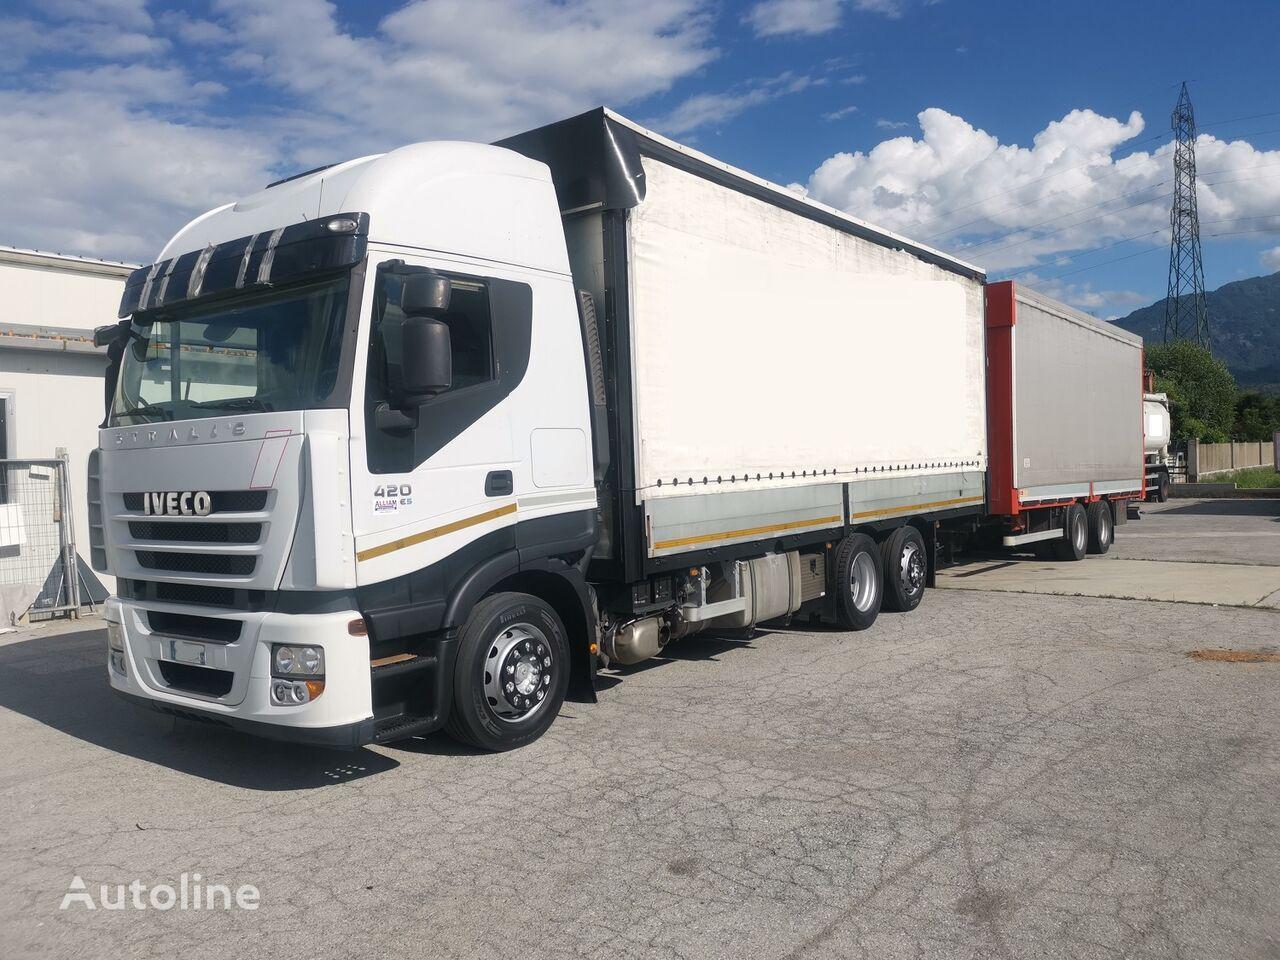 带防水布卡车 IVECO Iveco Stralis 420 + 带防水布拖车